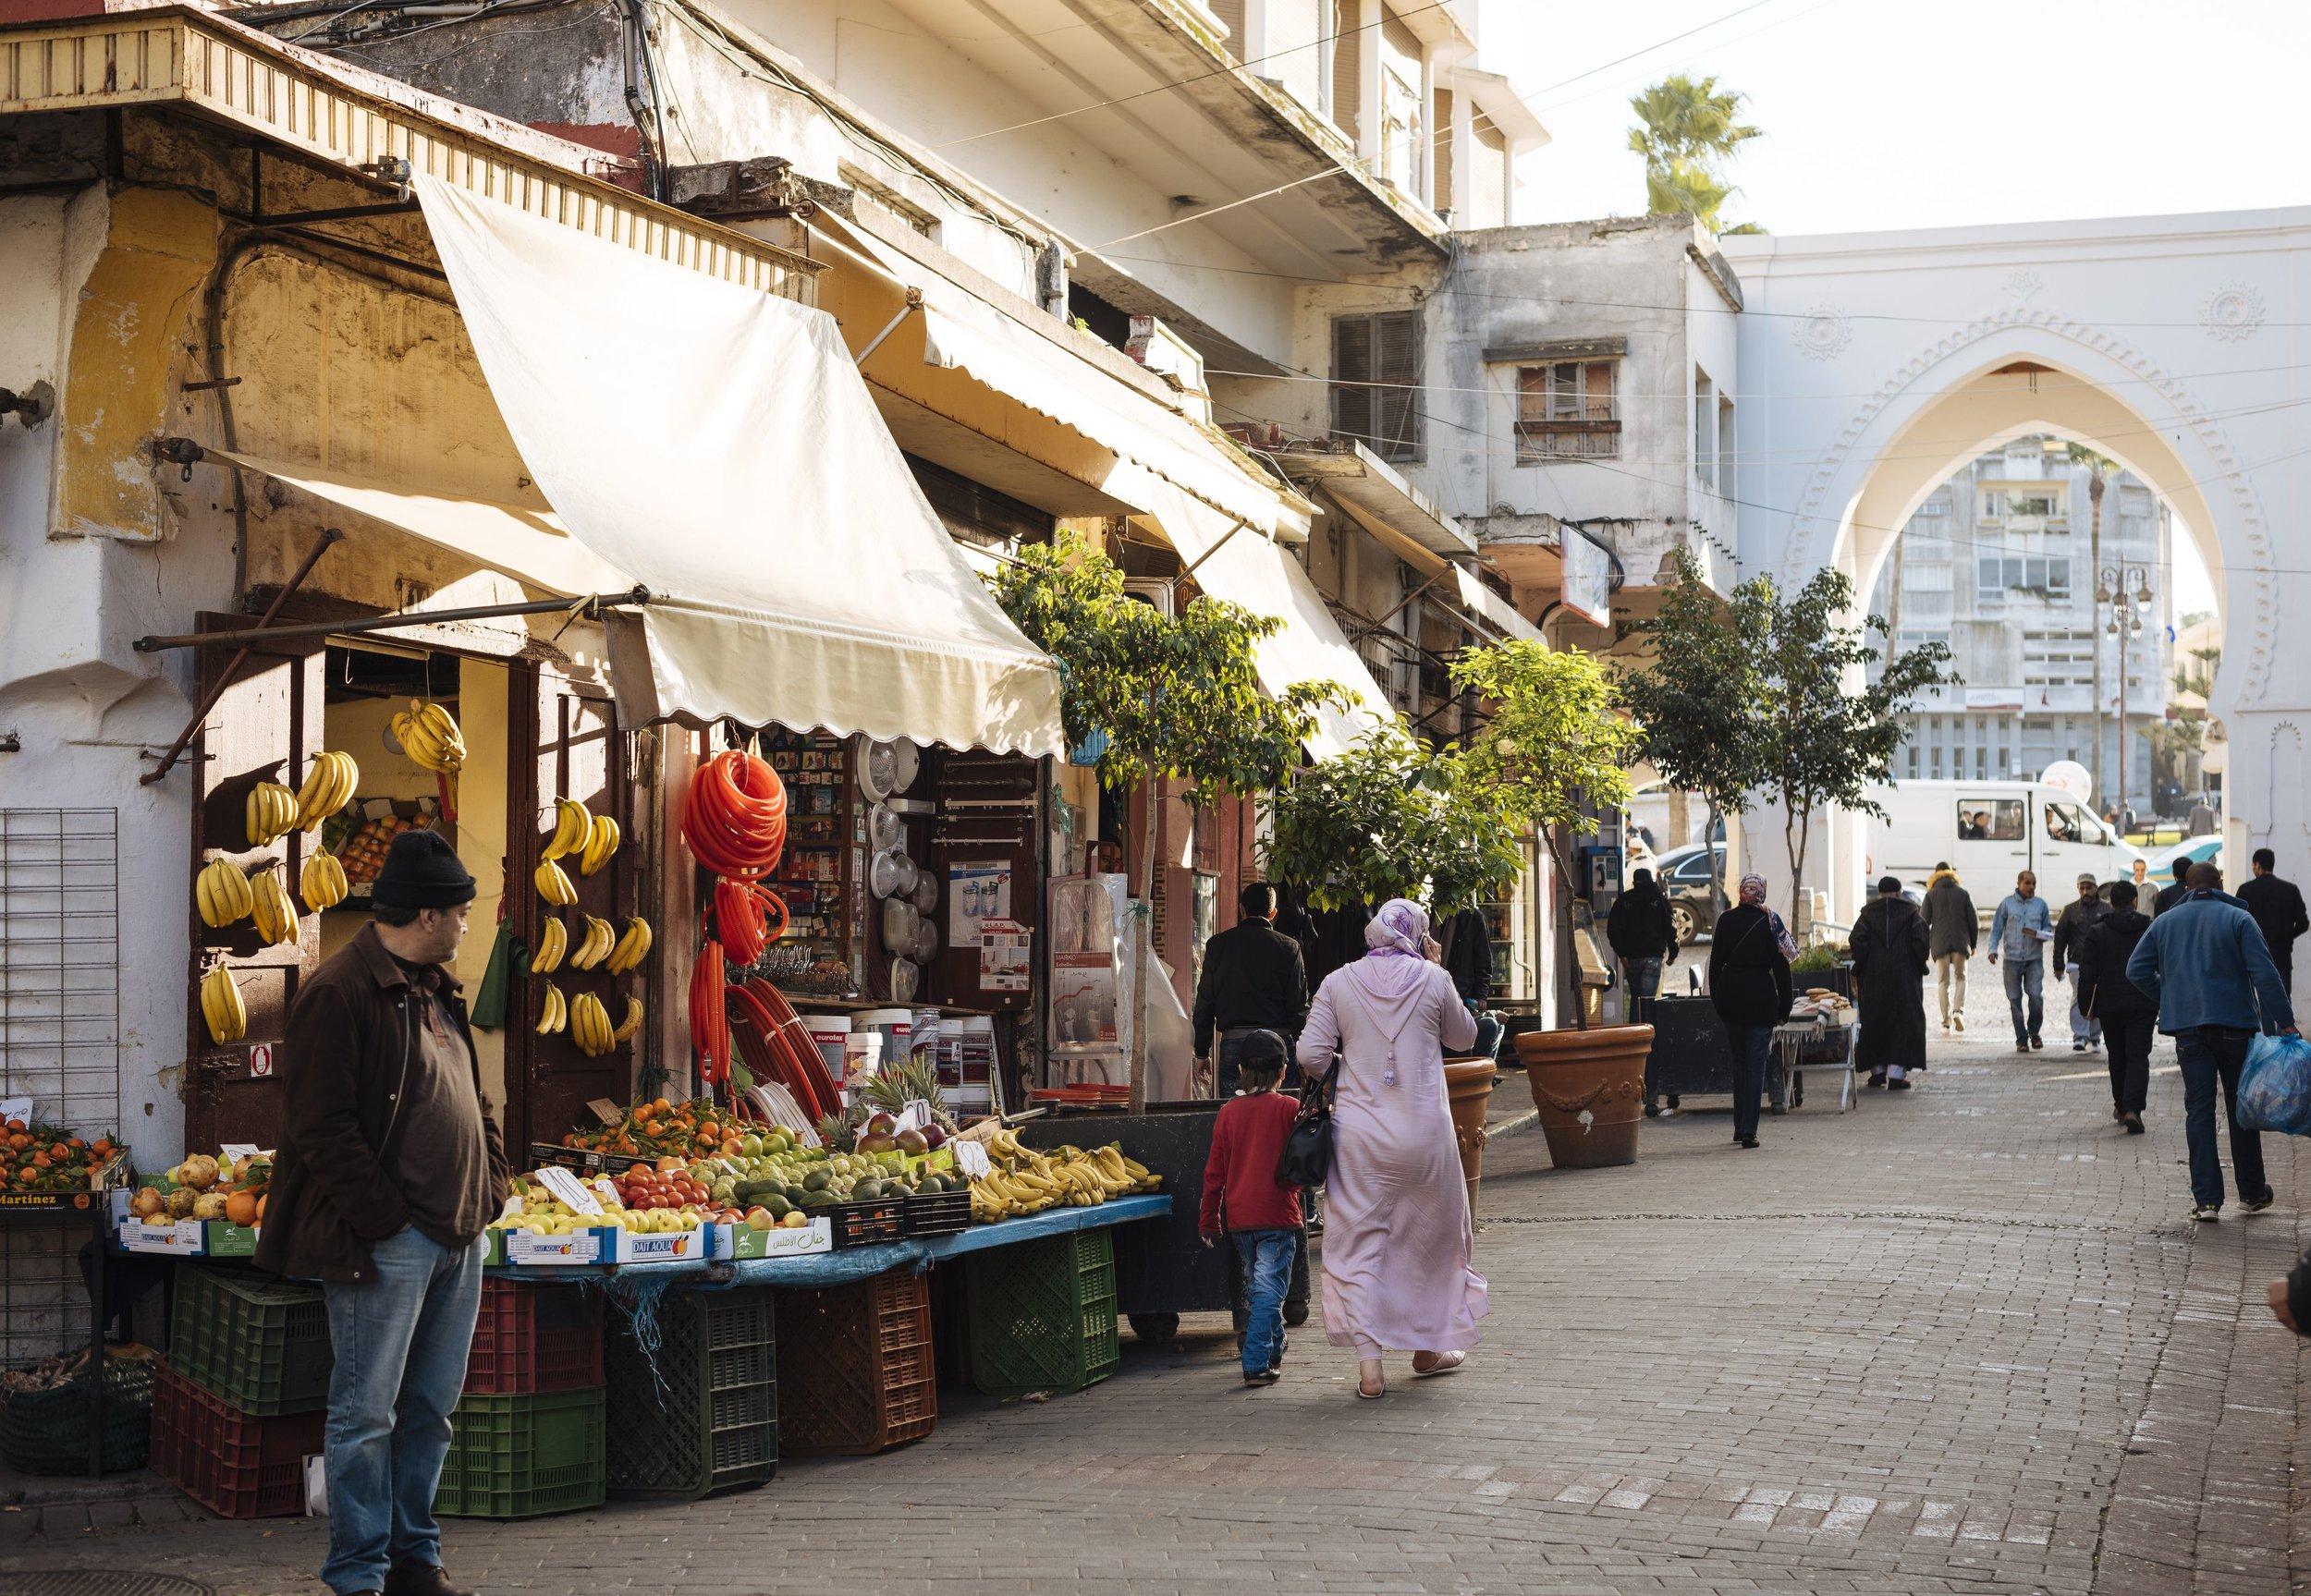 street-scene-in-the-medina--tangier--morocco--north-africa--africa-740535705-5c29759f46e0fb0001e89322.jpg